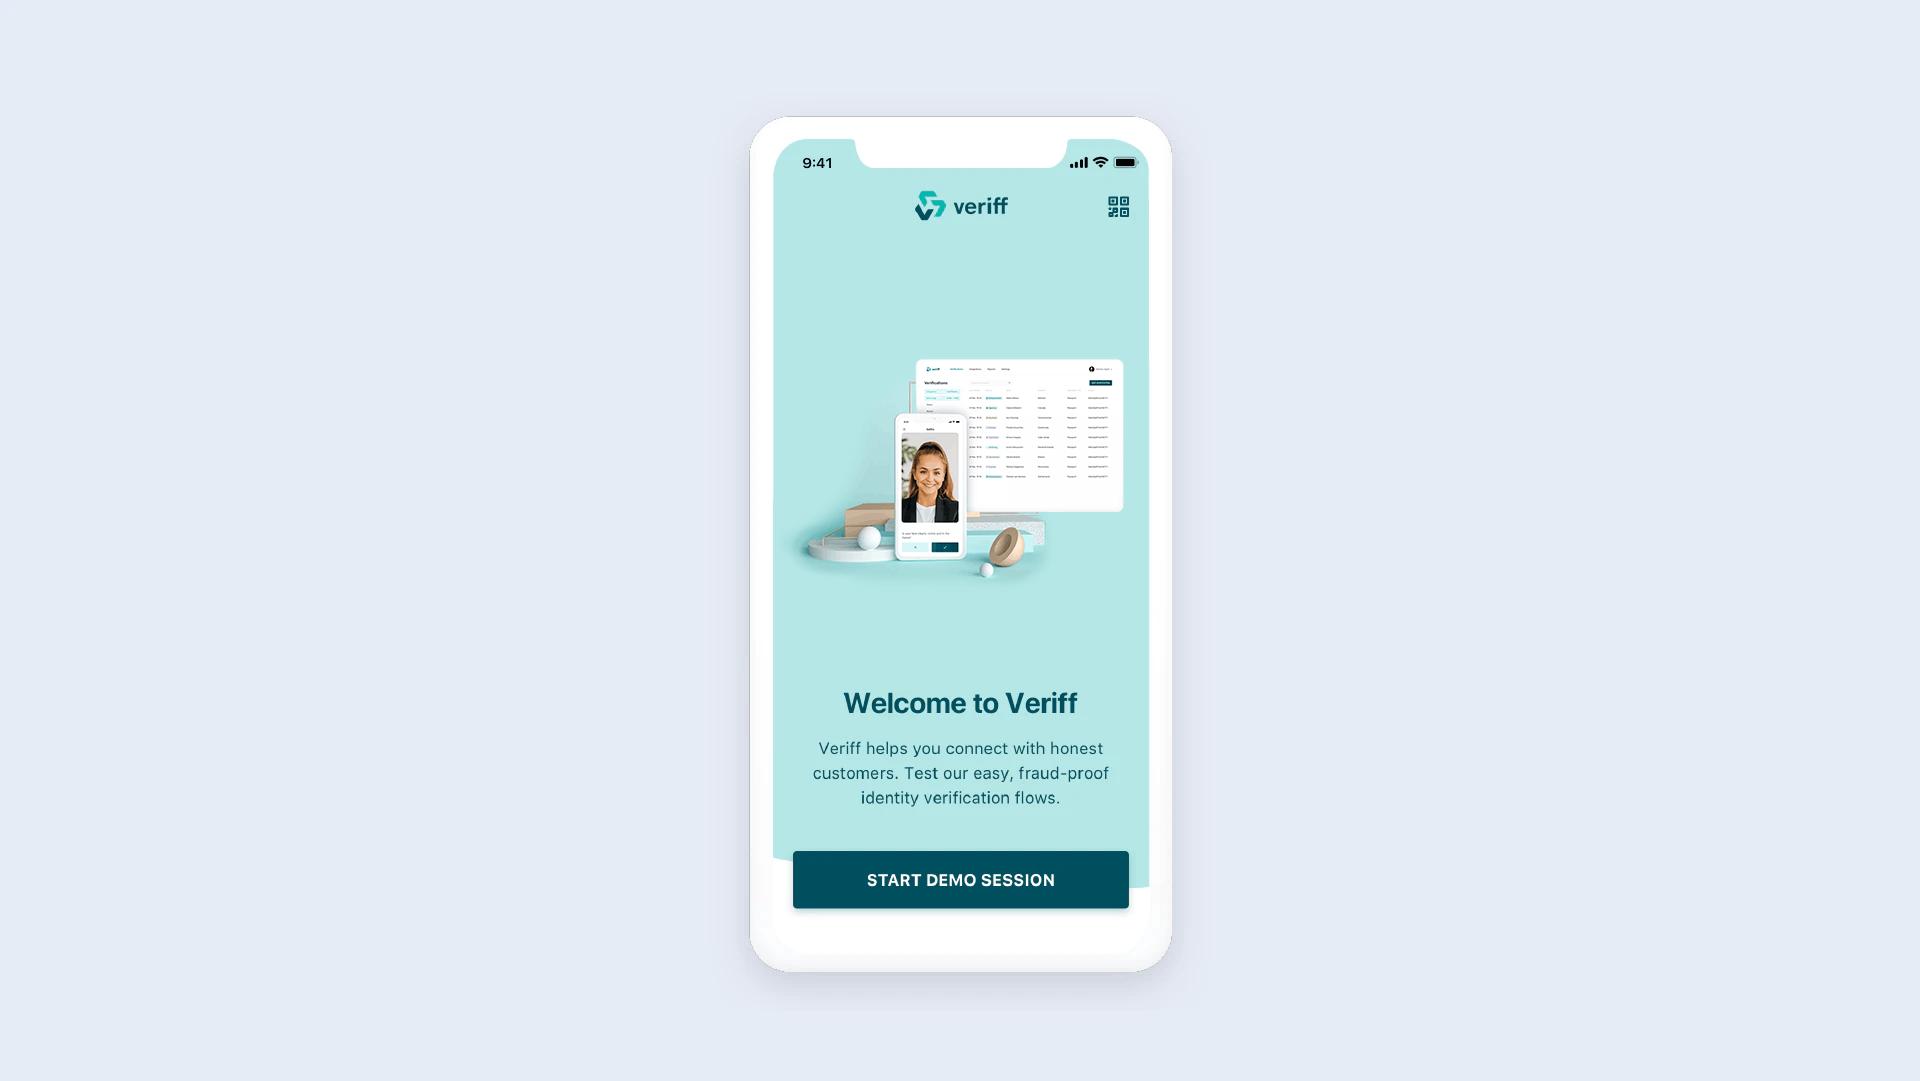 A look at Veriff's iOS demo app.